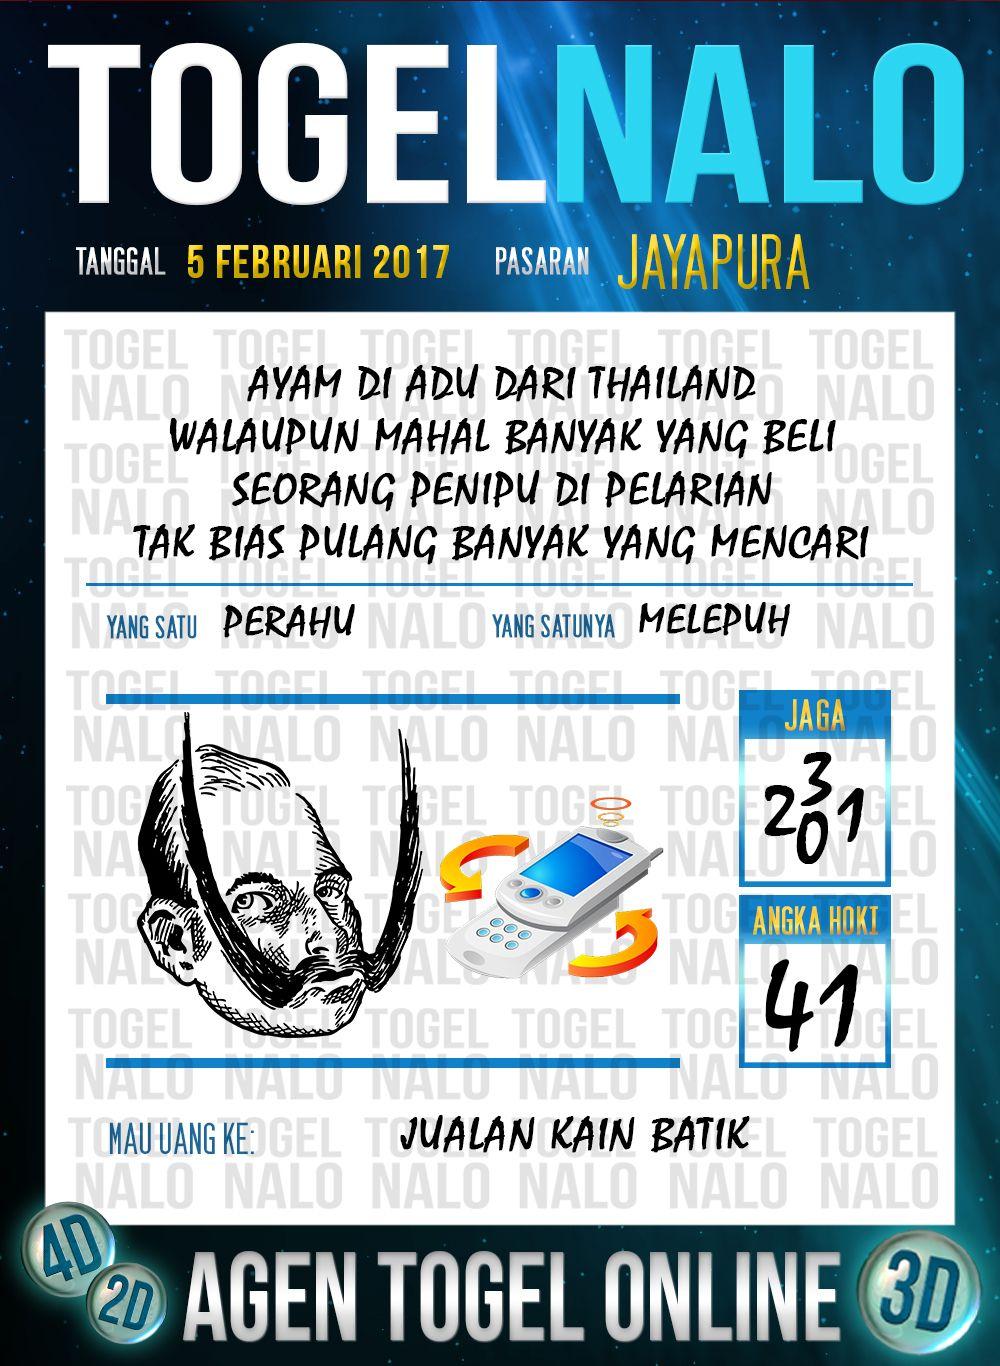 Acak Kode 2d Togel Wap Online Live Draw 4d Togelnalo Jayapura 5 Februari 2017 Januari 26 Januari 27 Januari